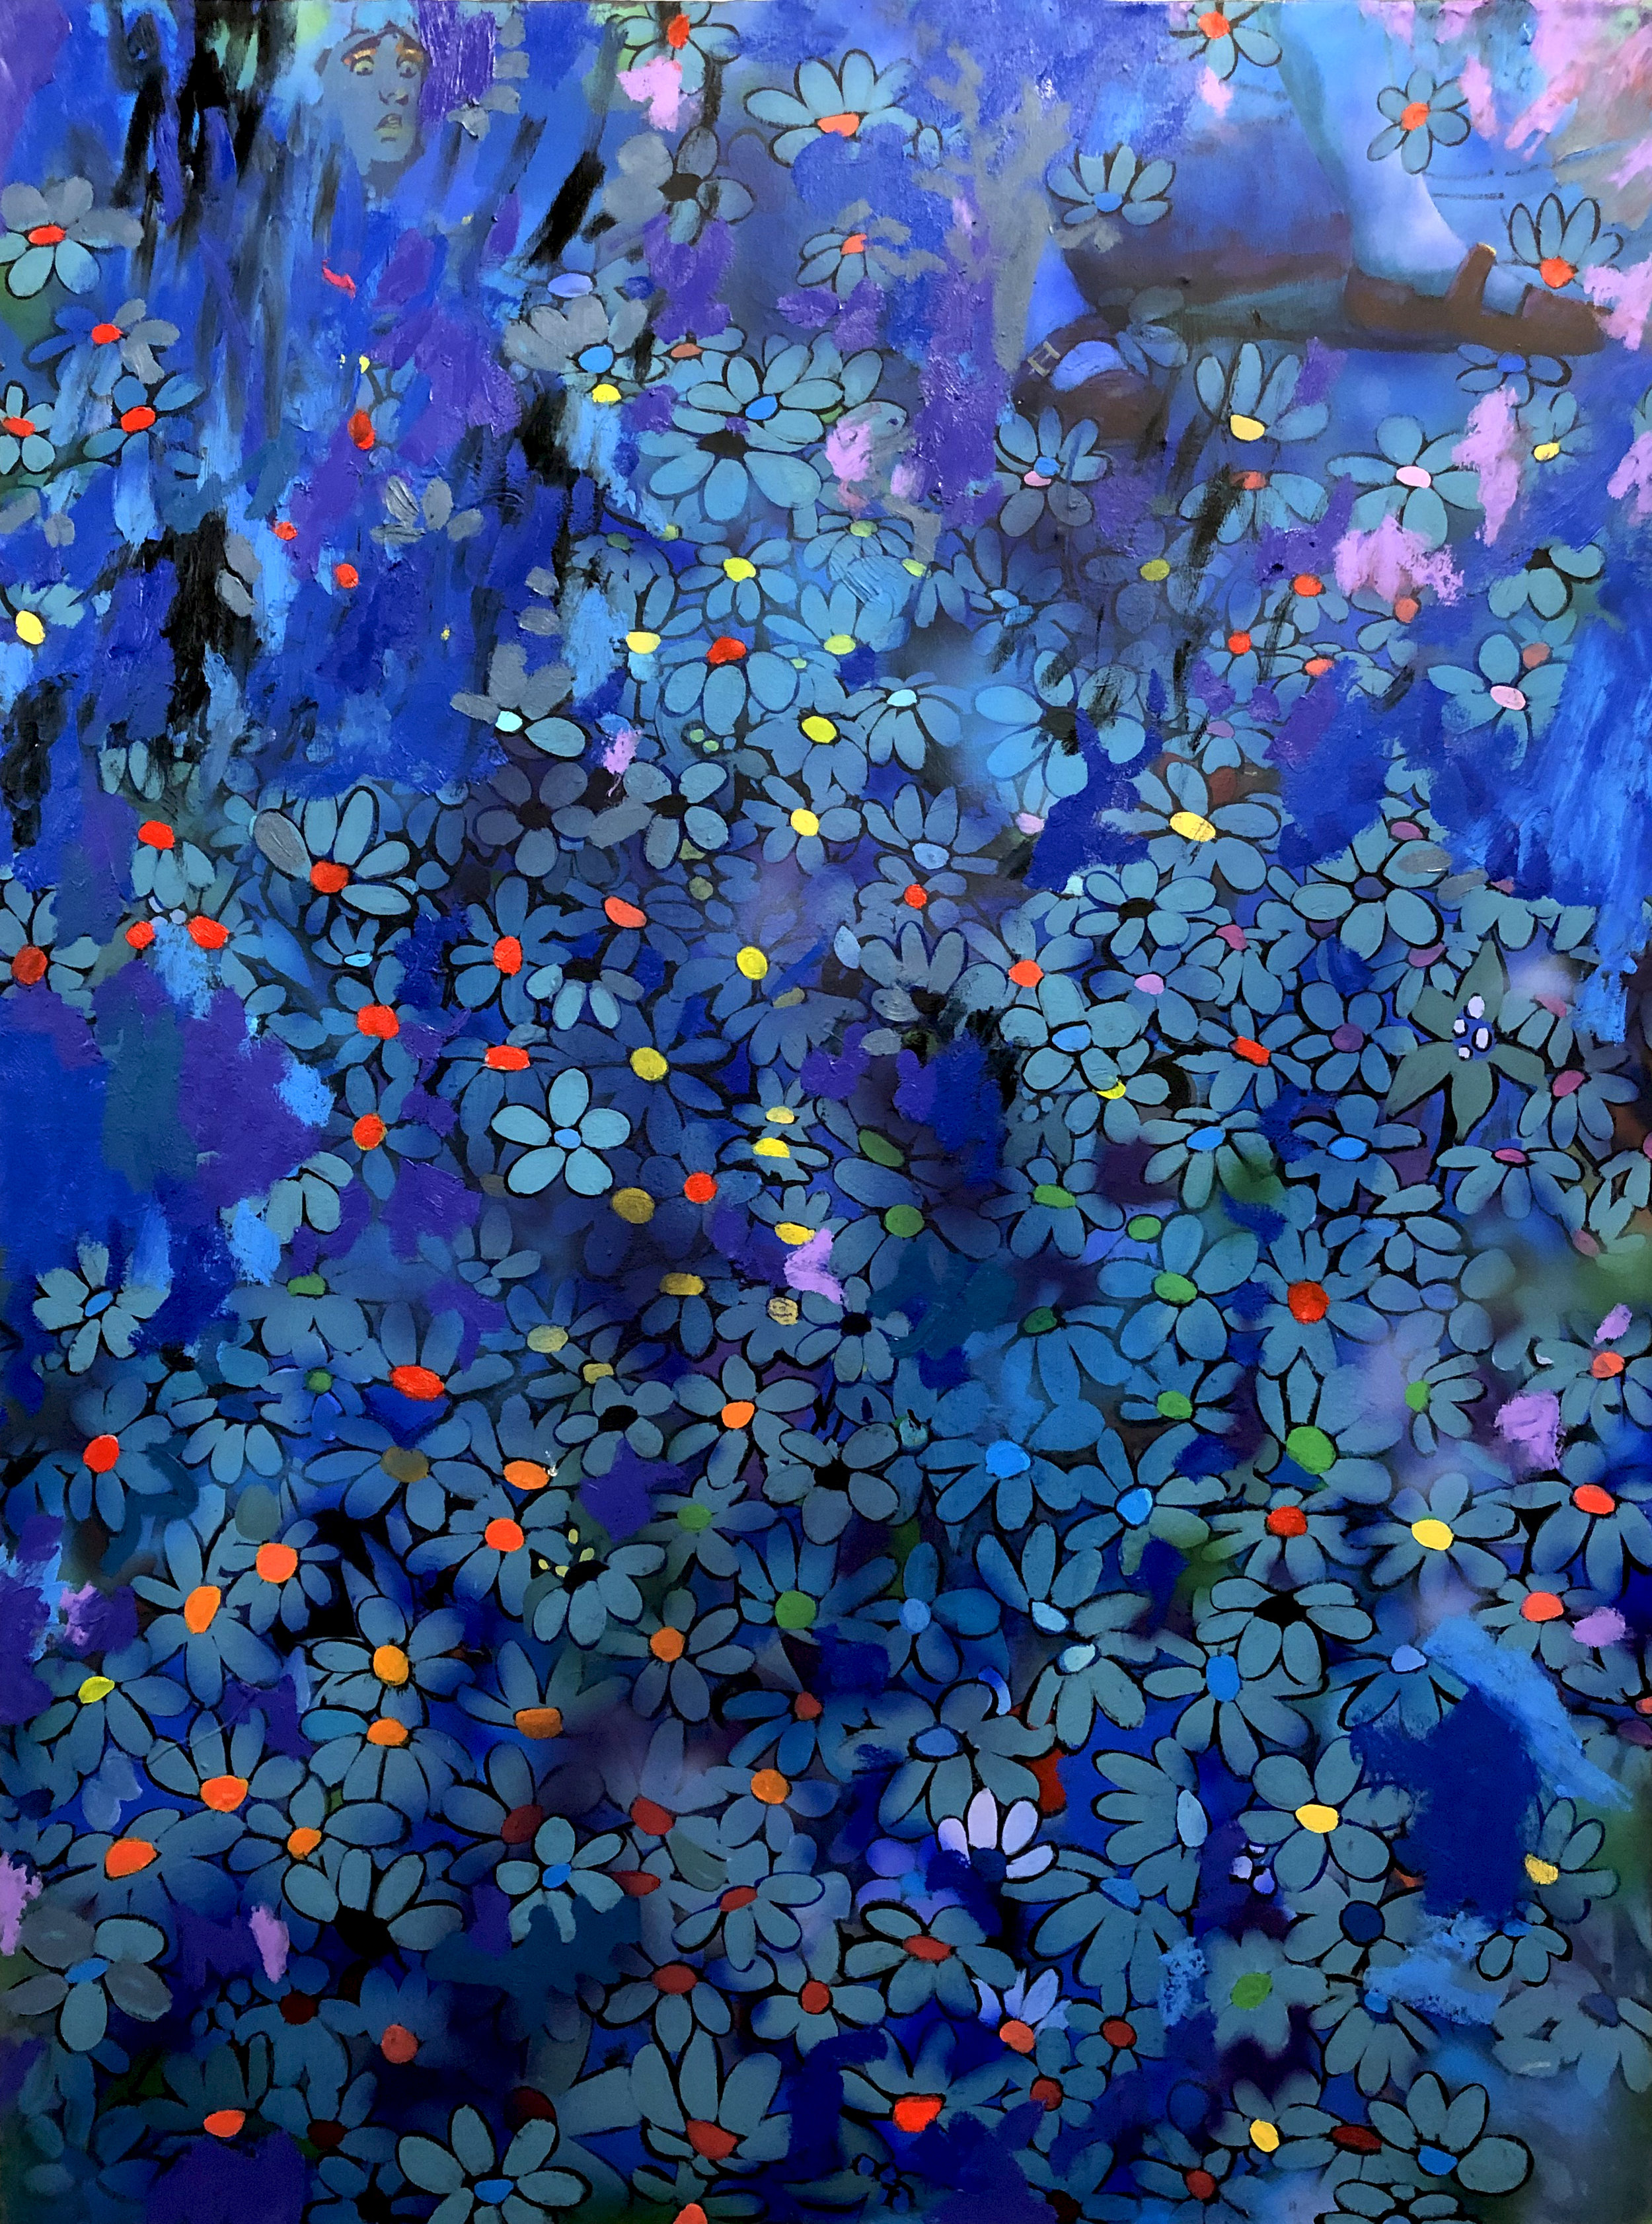 04_Joshua Petker, 48x36%22 acrylic and oil on canvas, 2018.jpg